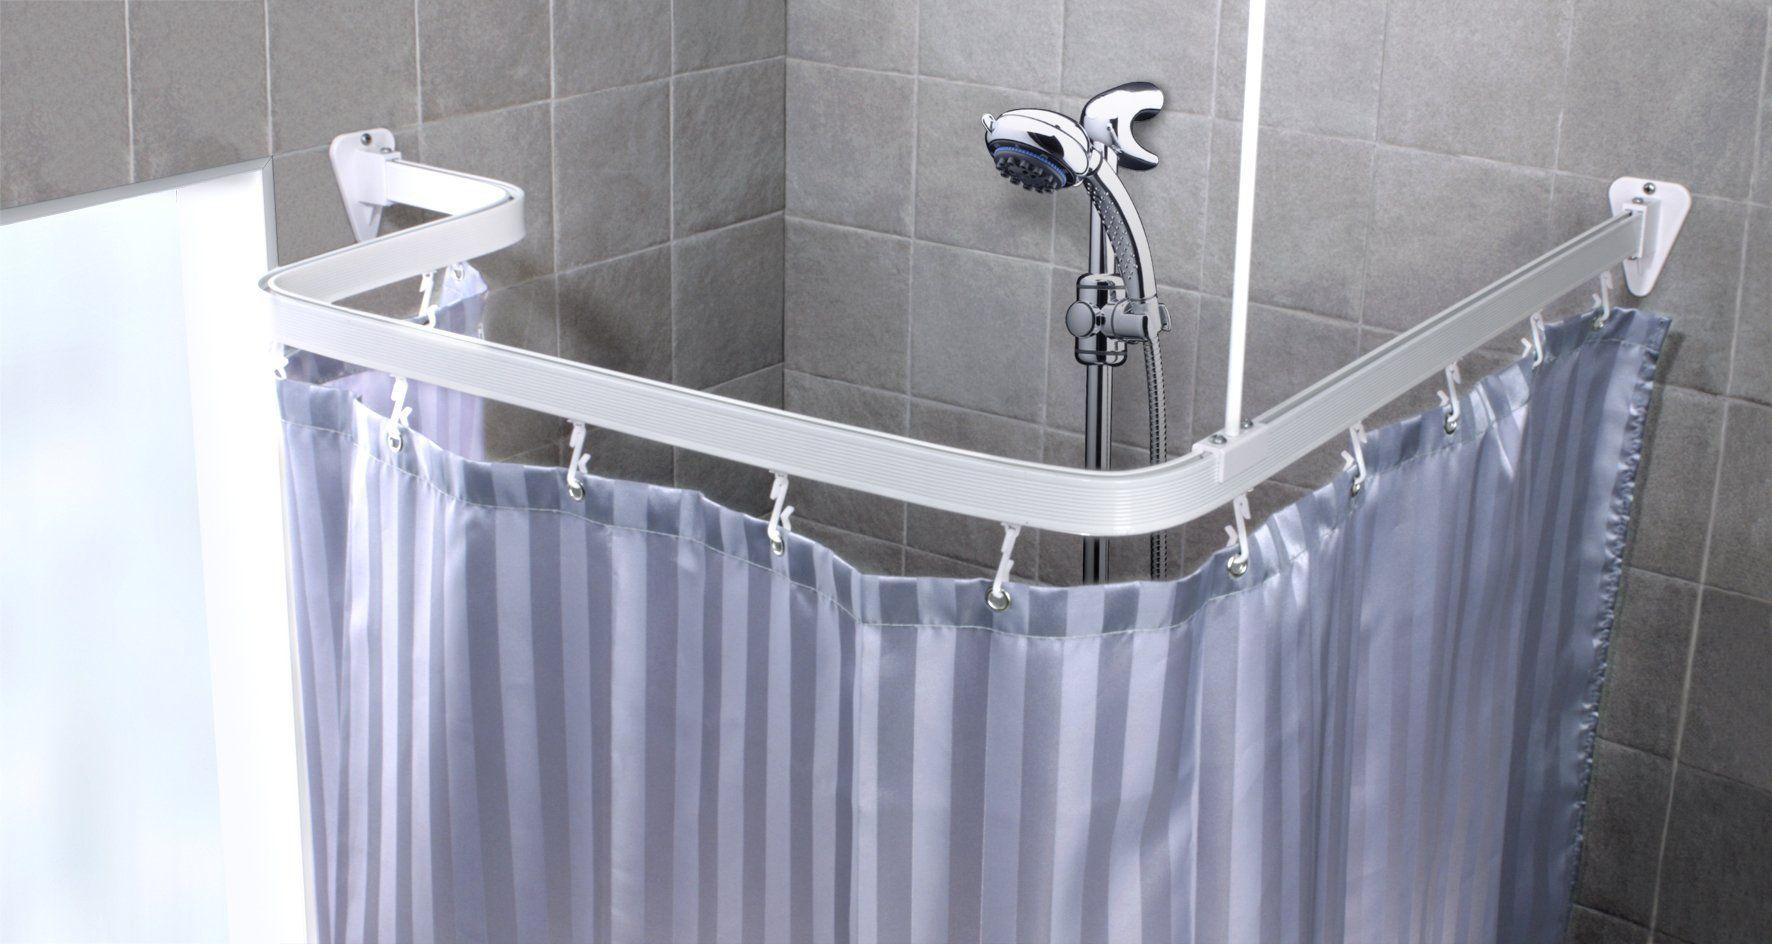 Chrome Bendi Track Hand Bendable Shower Curtain Rail Full Kit With Ings Co Uk Kitchen Home